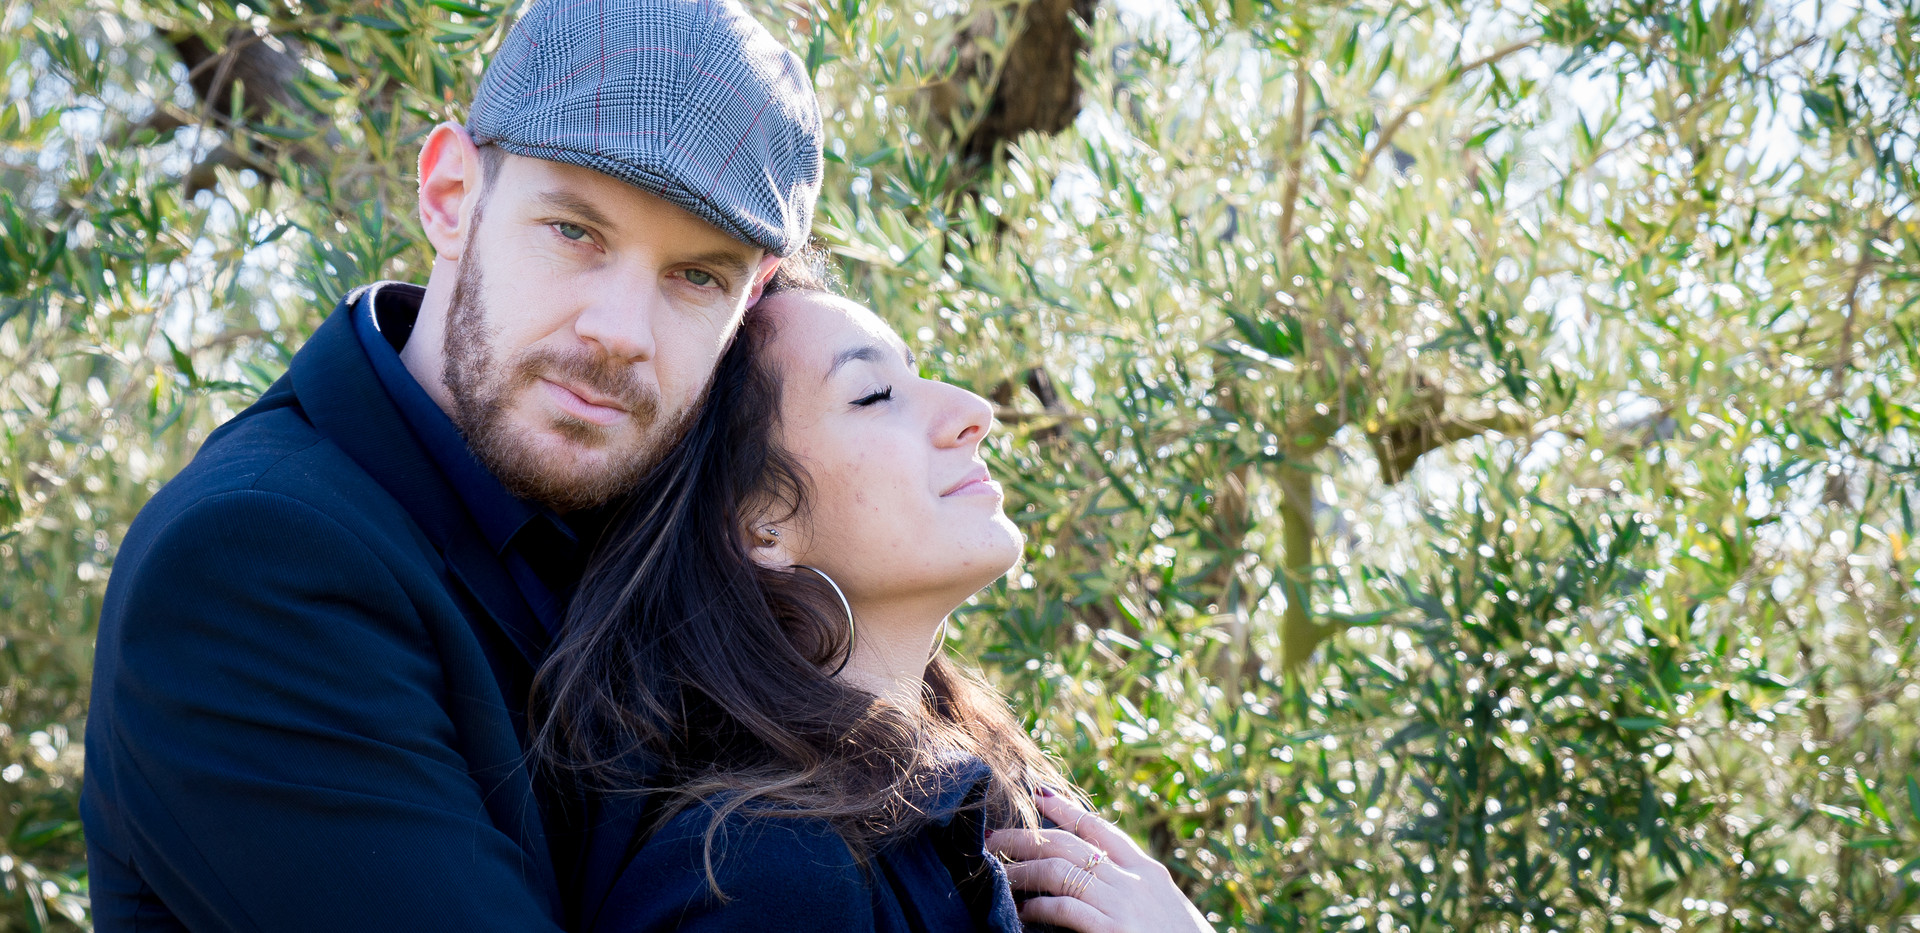 photo couple tendresse olivier aix en provence